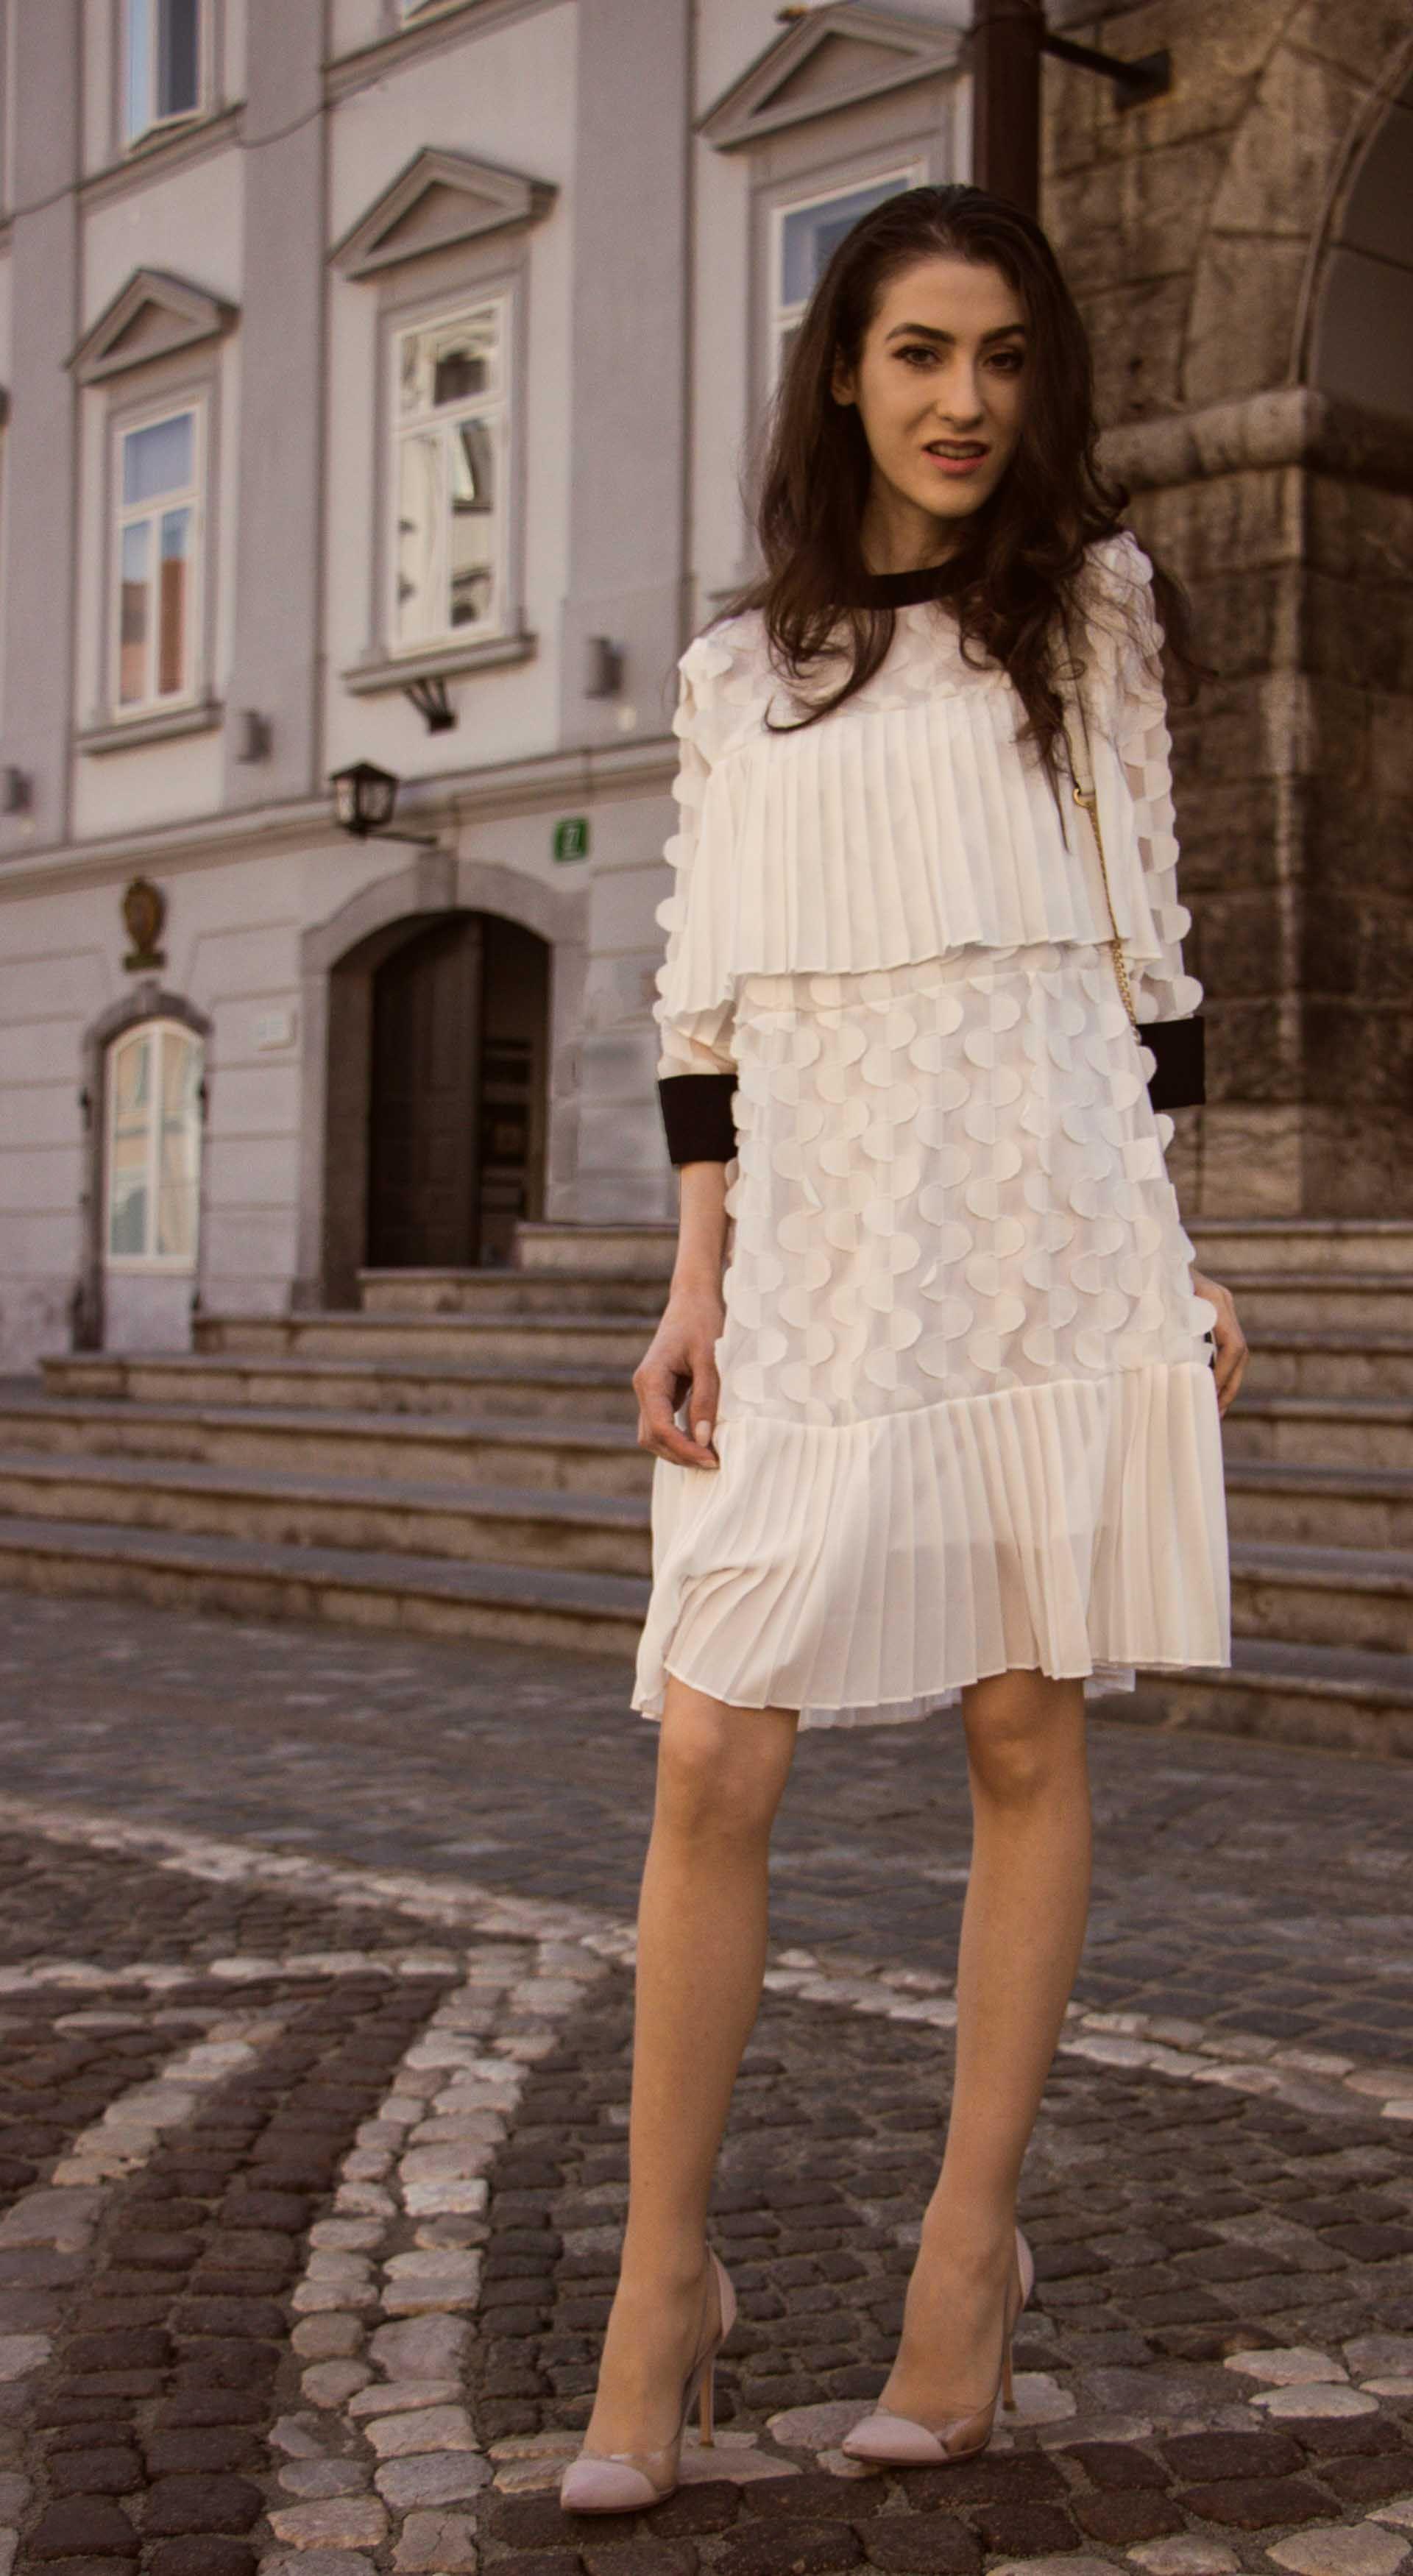 Fashion blogger veronika lipar of brunette from wall street sharing